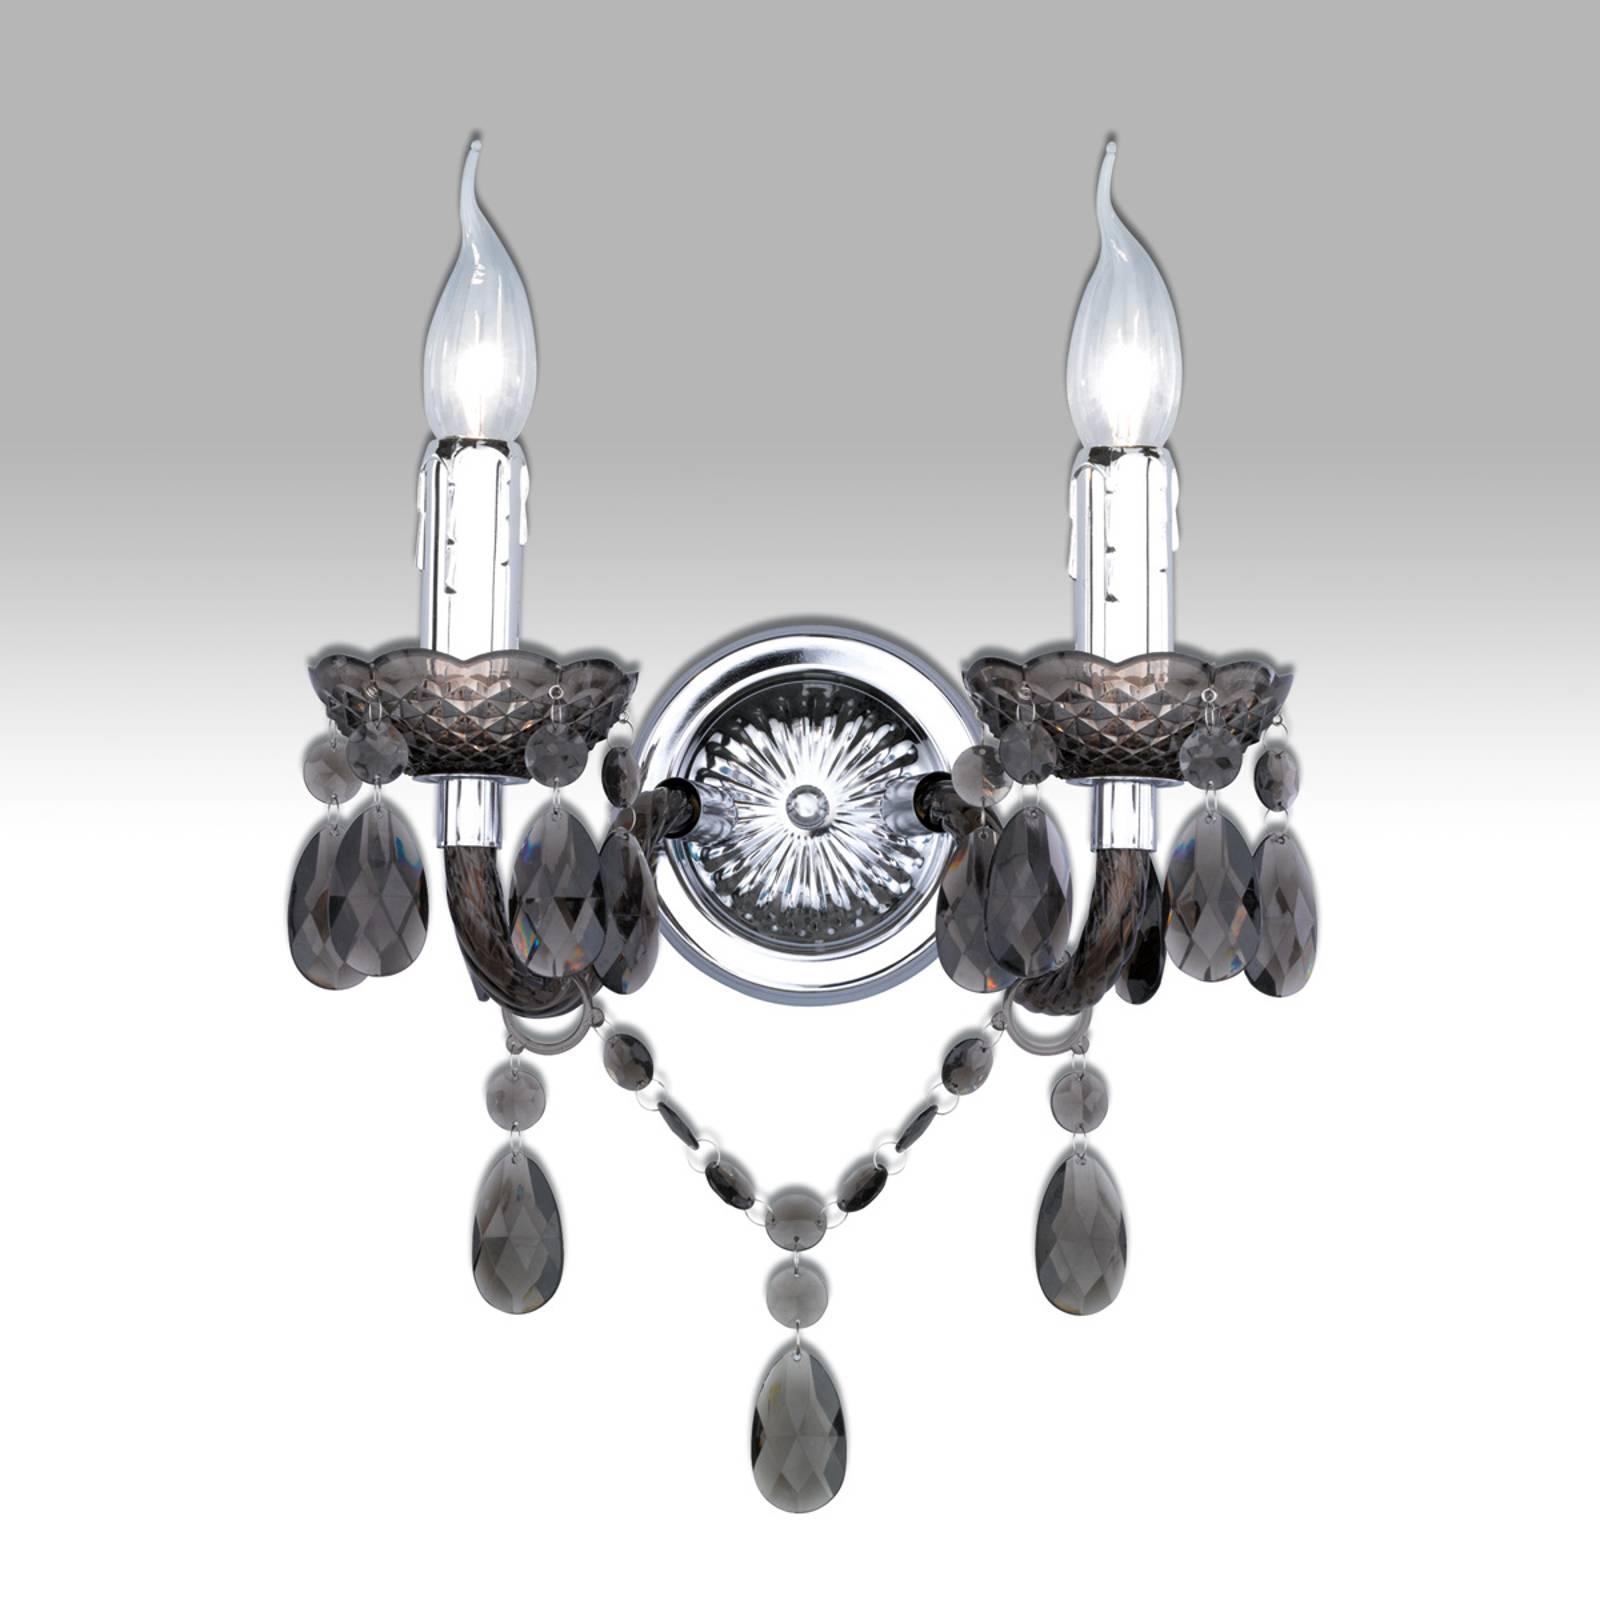 Met zwart acryl gordijn - wandlamp Perdita